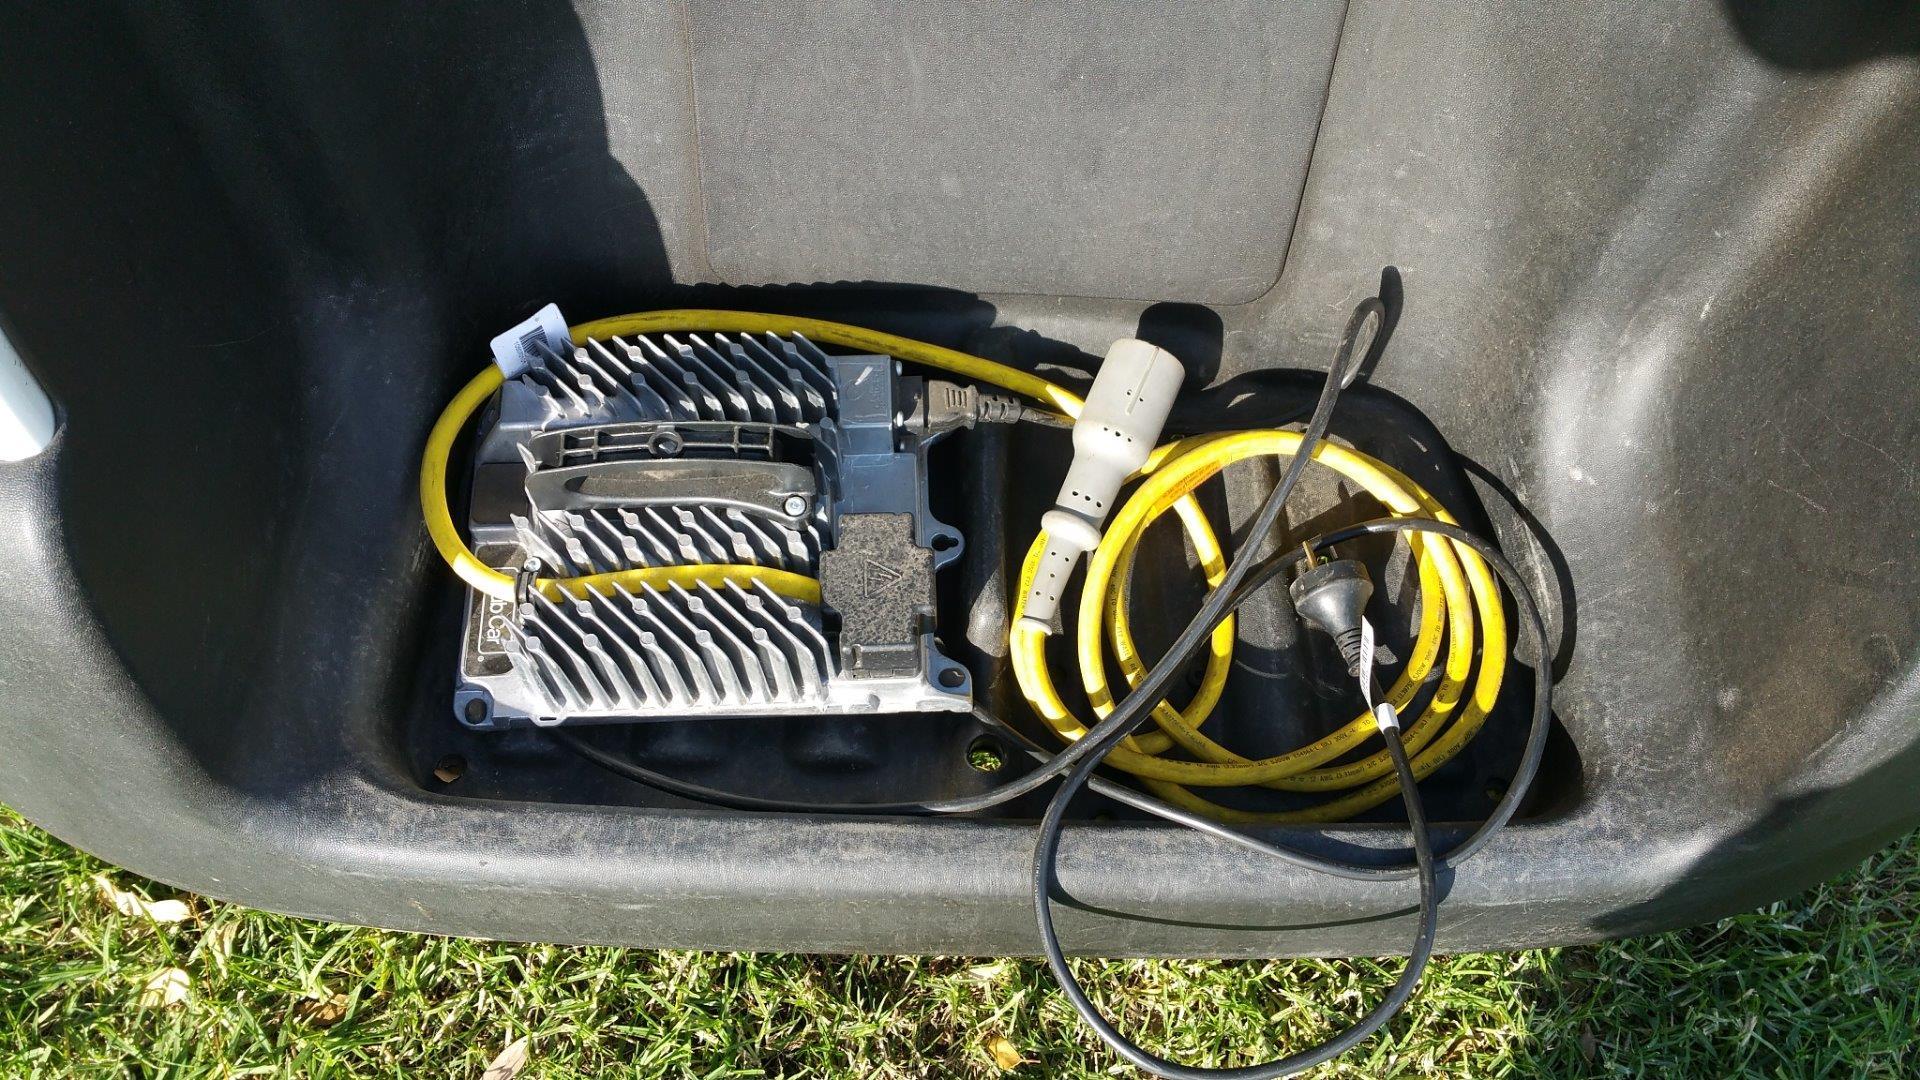 Used Car Batteries Near Me >> USED 2015 CLUB CAR PRECEDENT 48V ELECTRIC GOLF CART KART CAR BUGGY